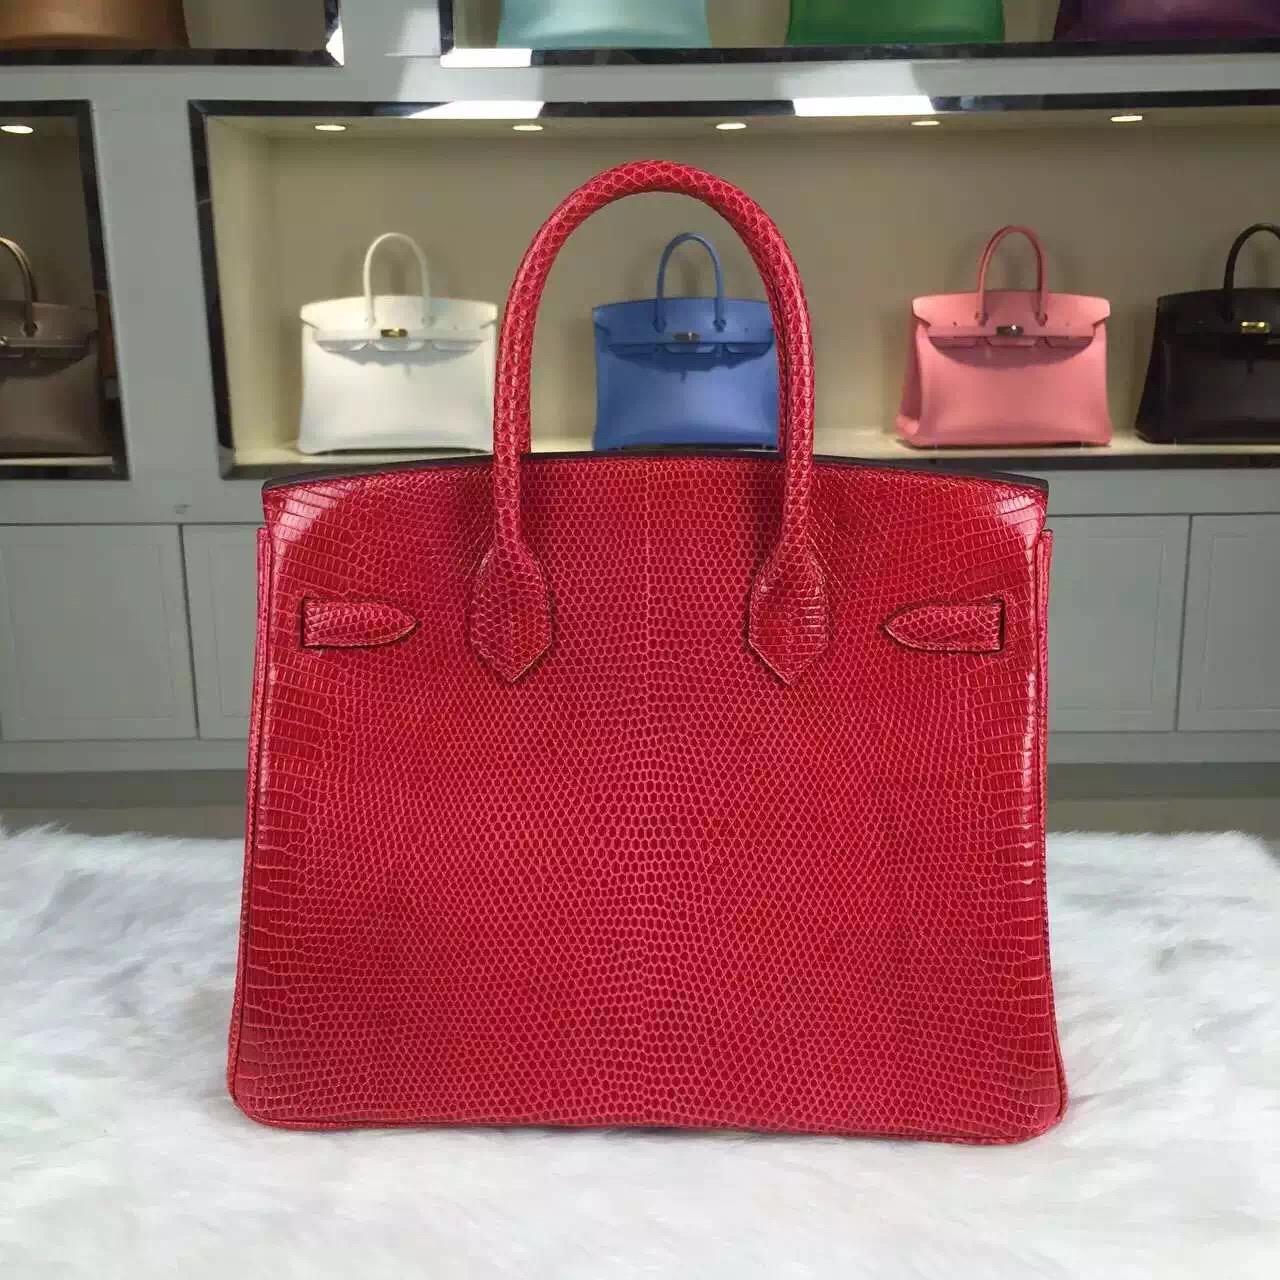 Hand Stitching Hermes Birkin Bag 30cm France Original Lizard Skin in Red